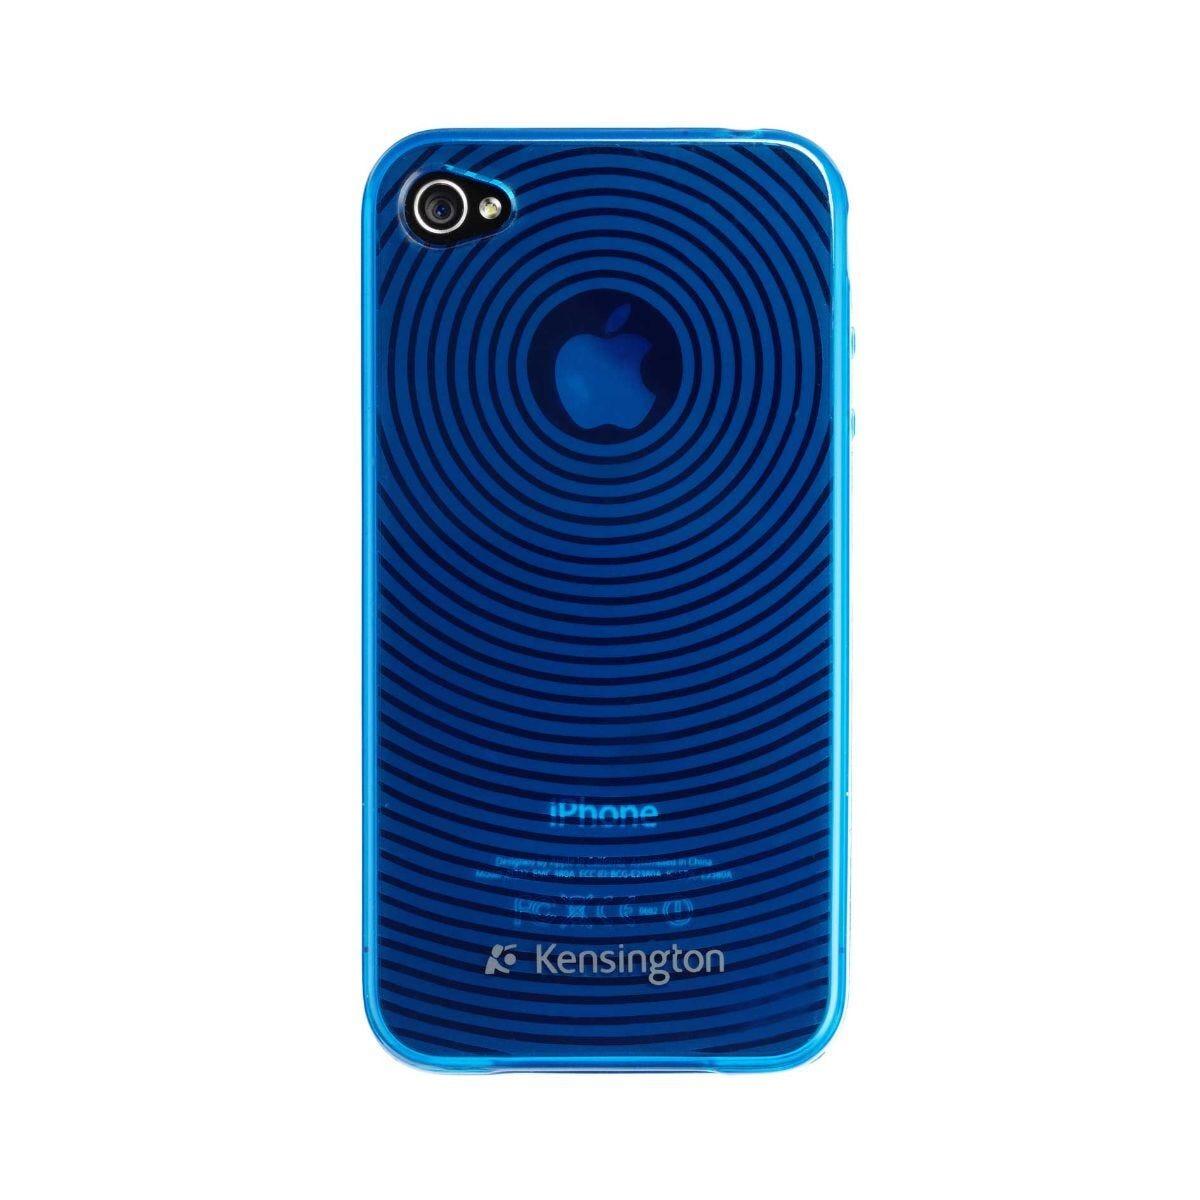 Kensington iPhone 4 Grip Case